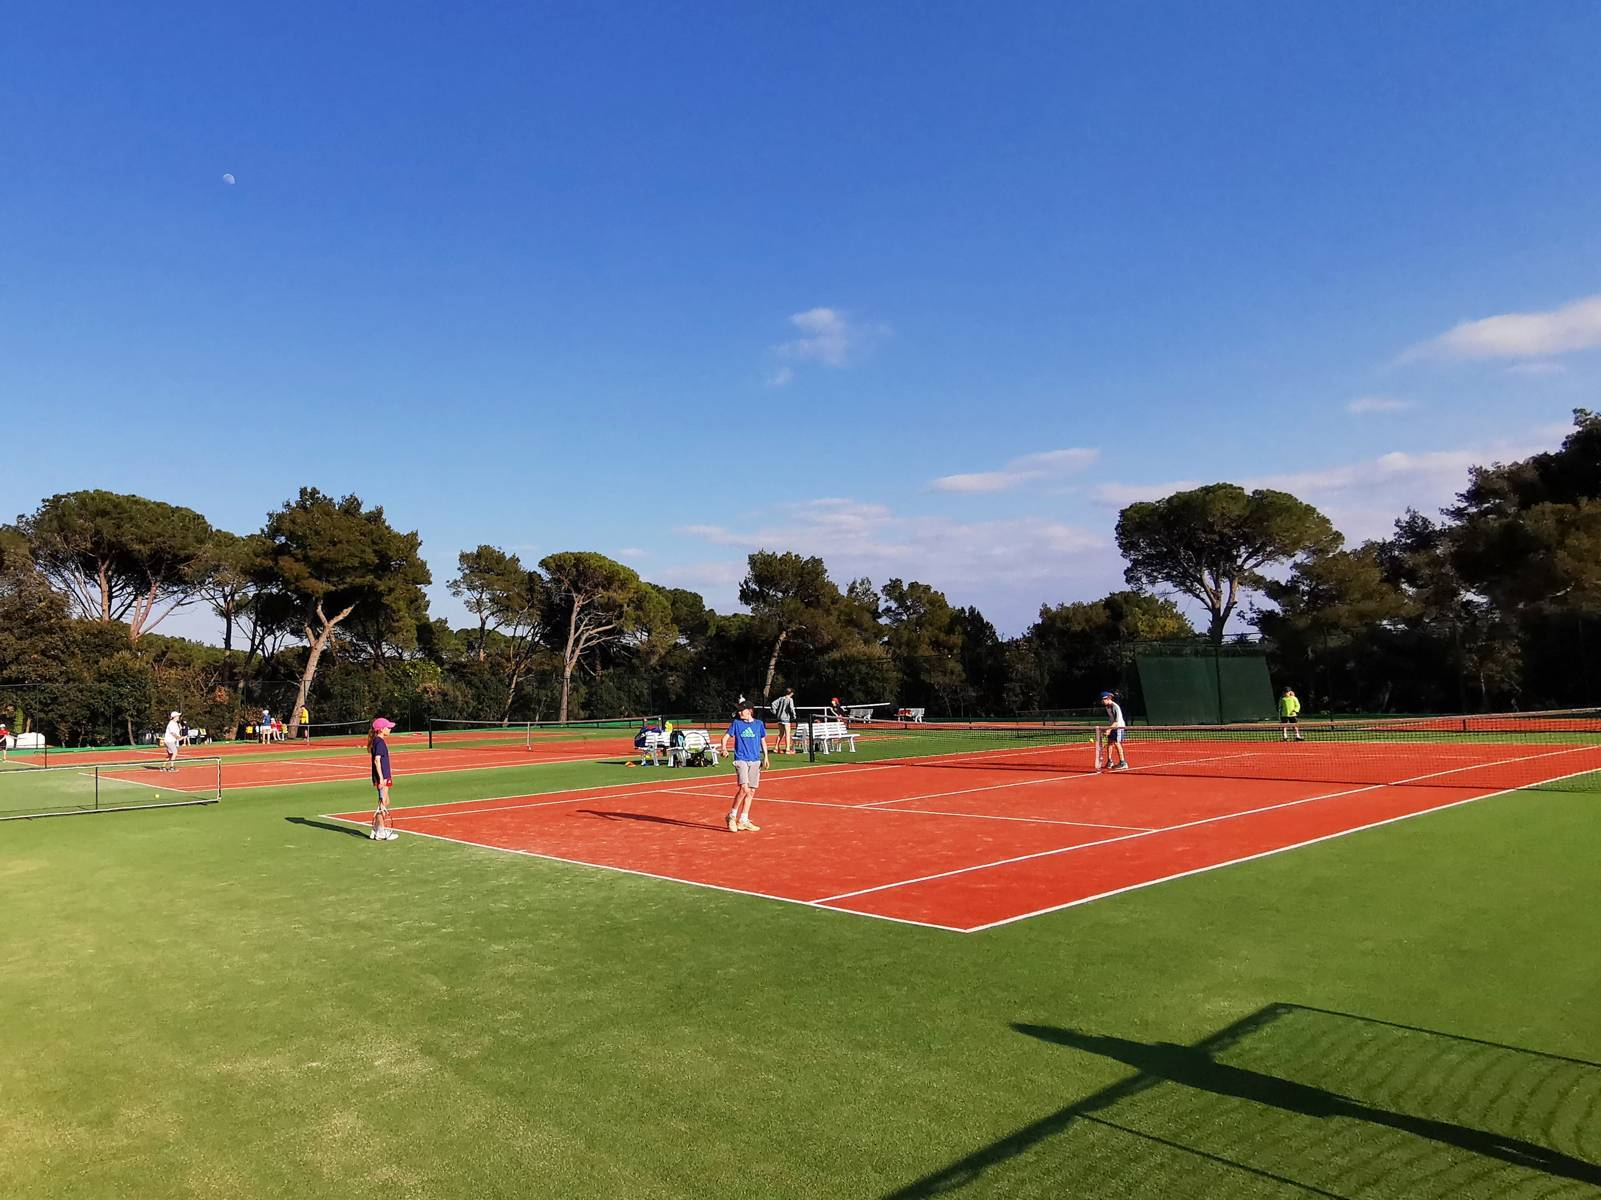 tennis-holidays-croatia-2019-41.jpeg